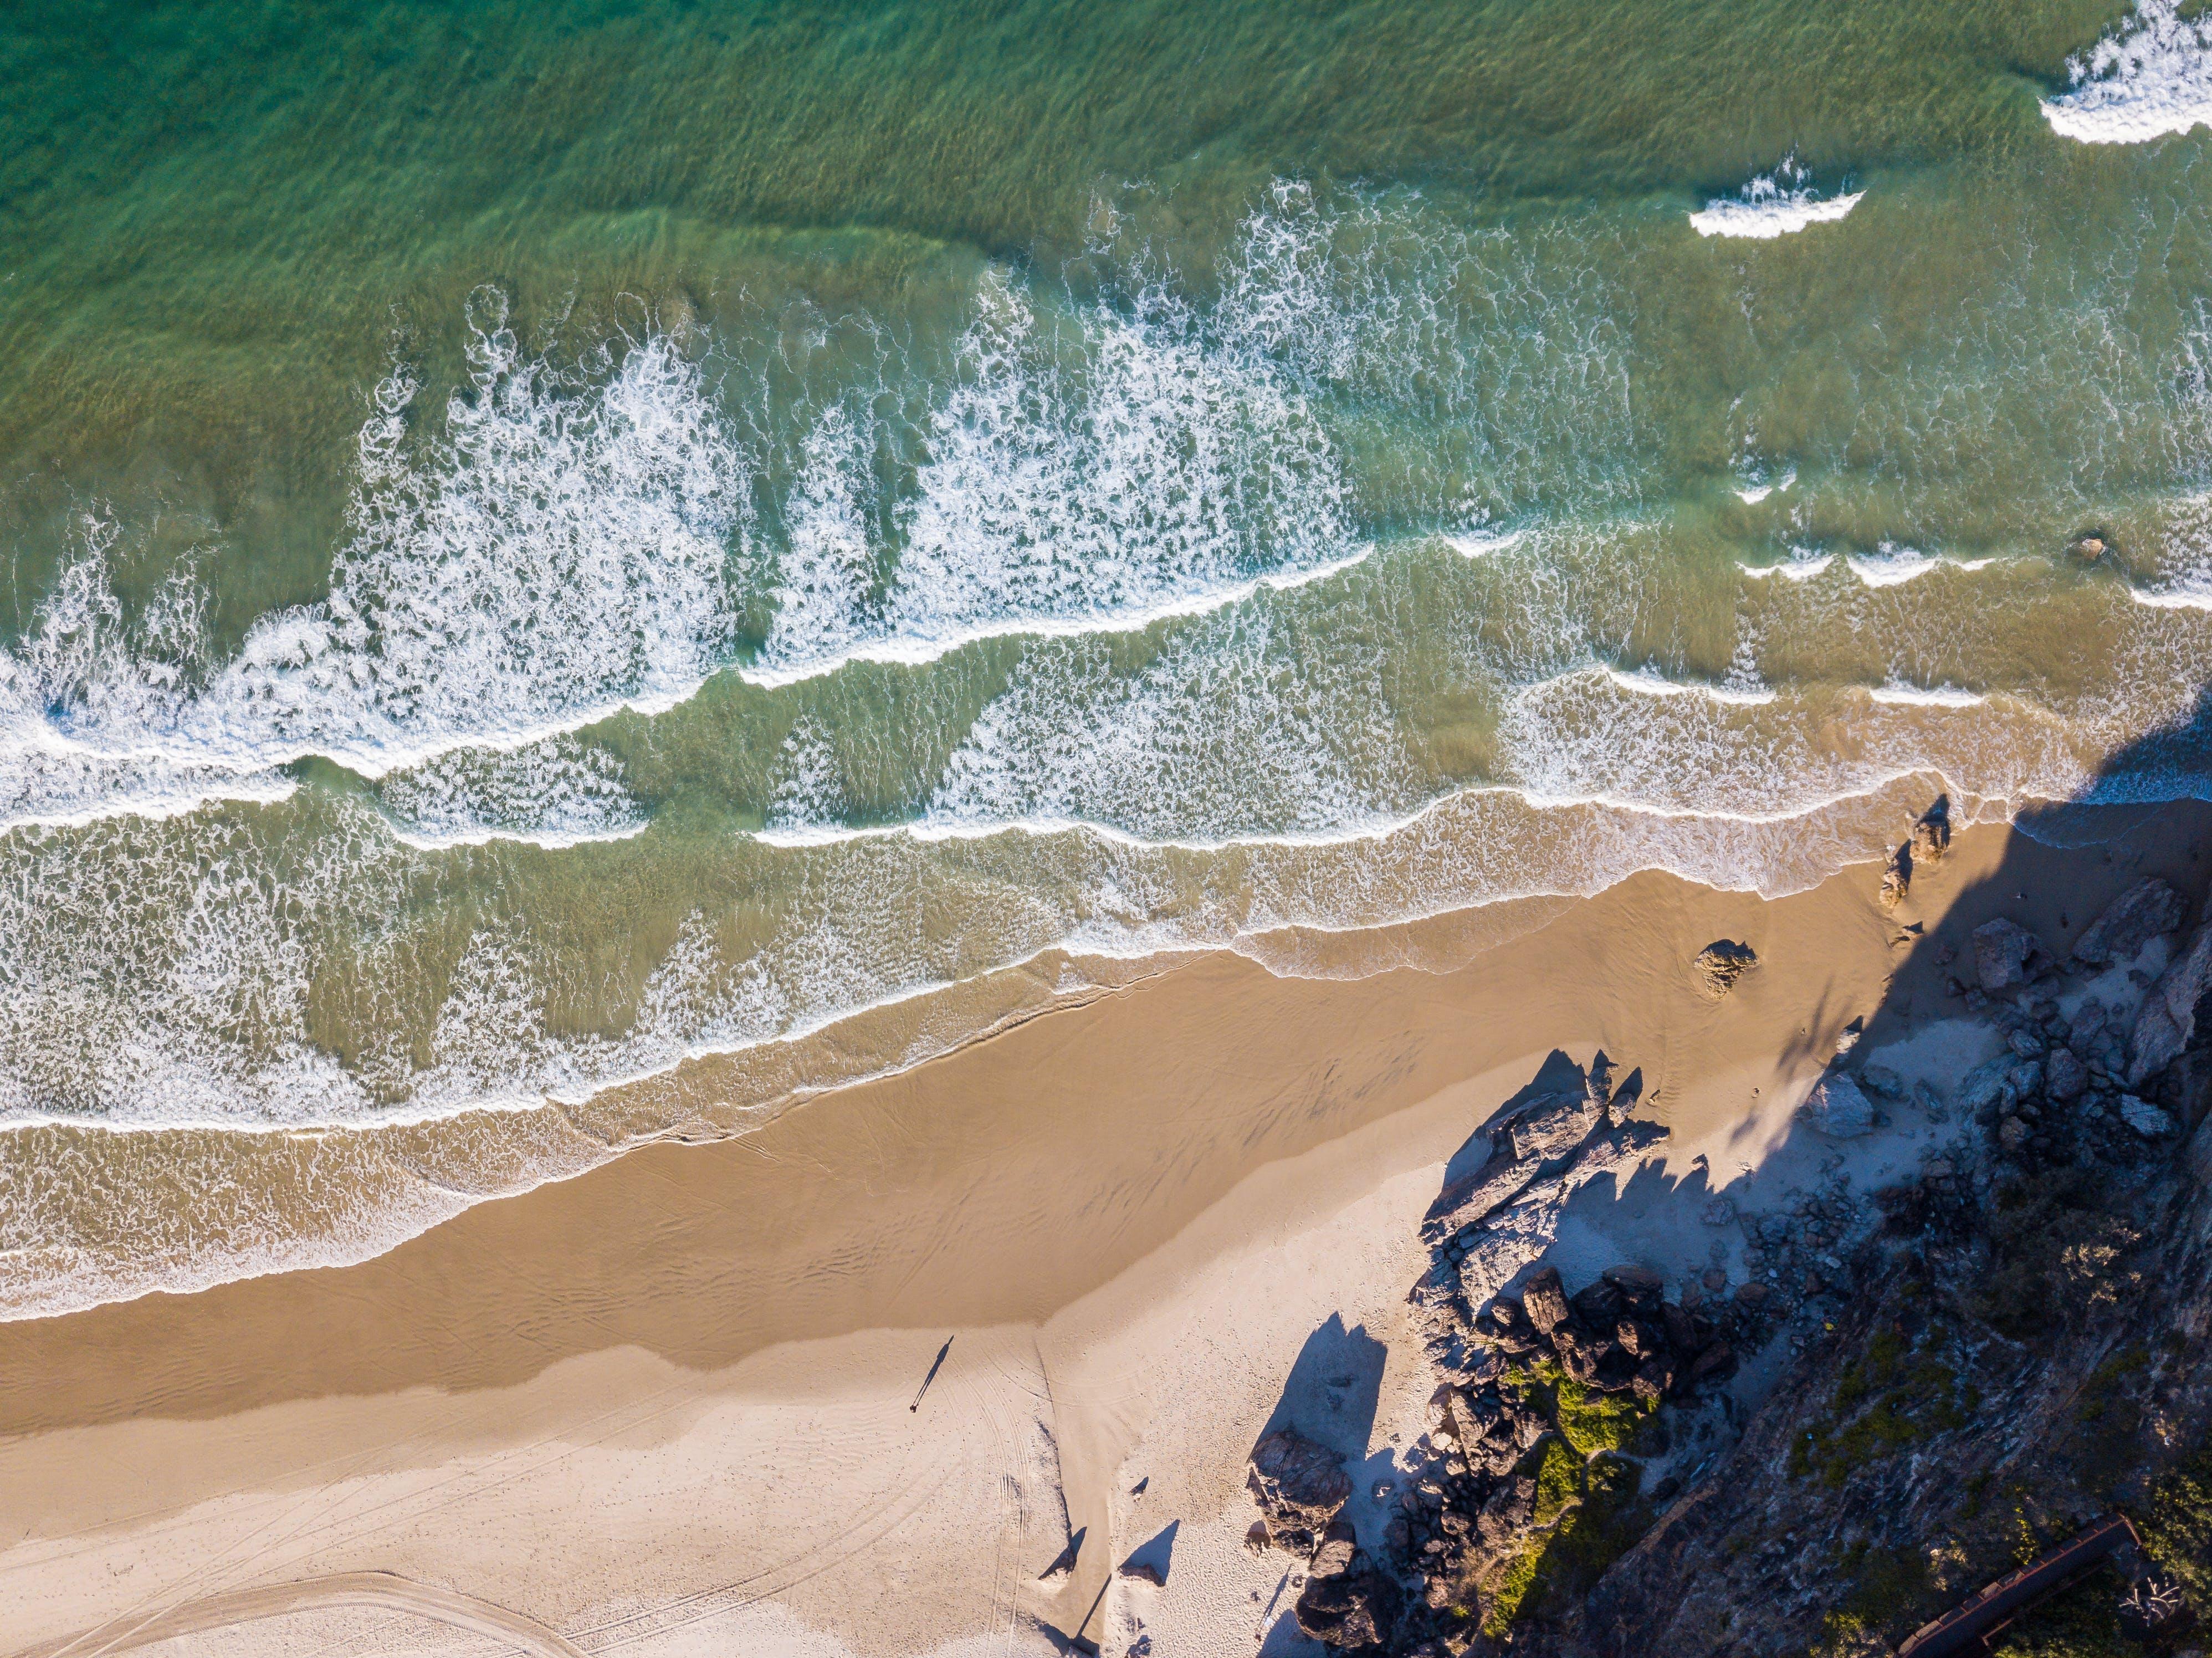 High Angle Photography Of Beach